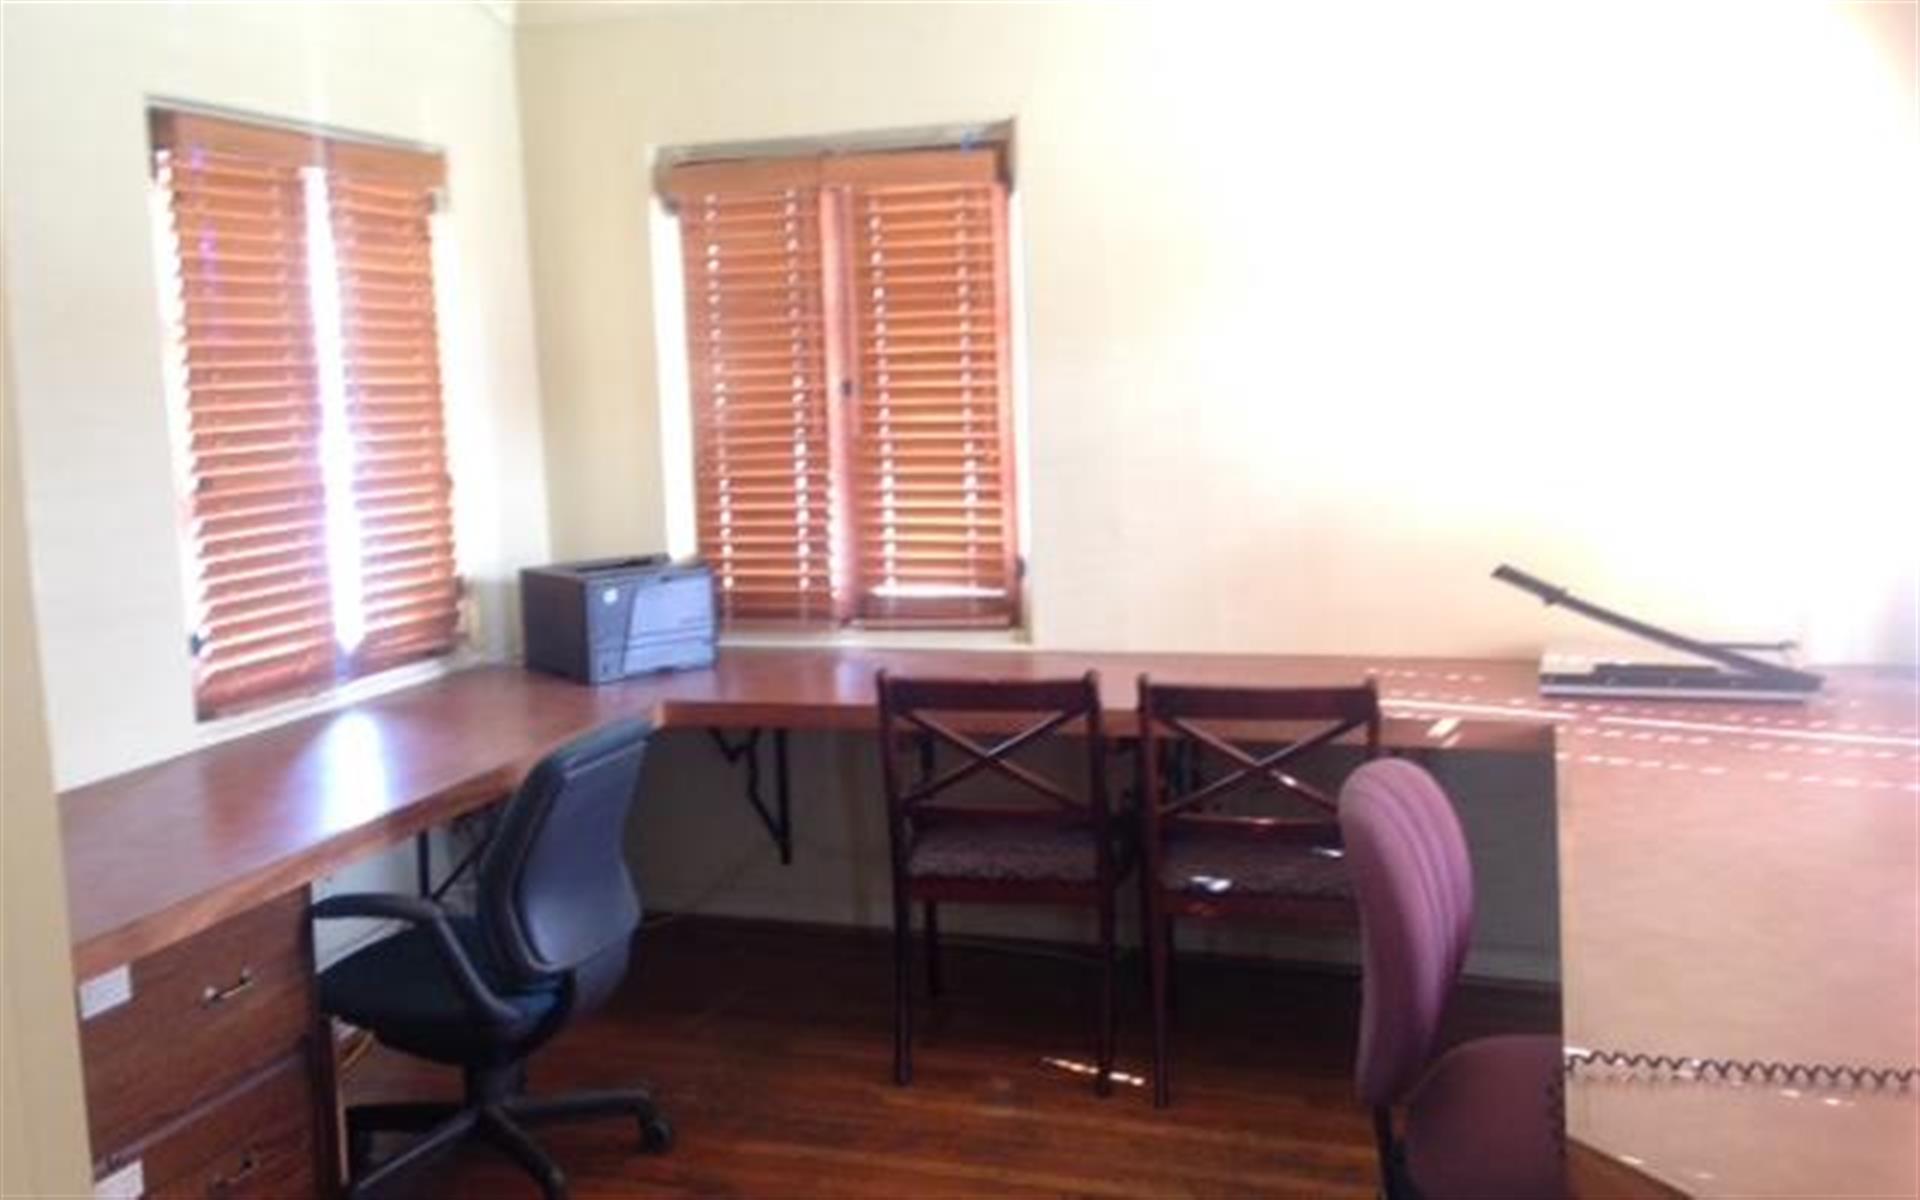 Coneybeare - small team office